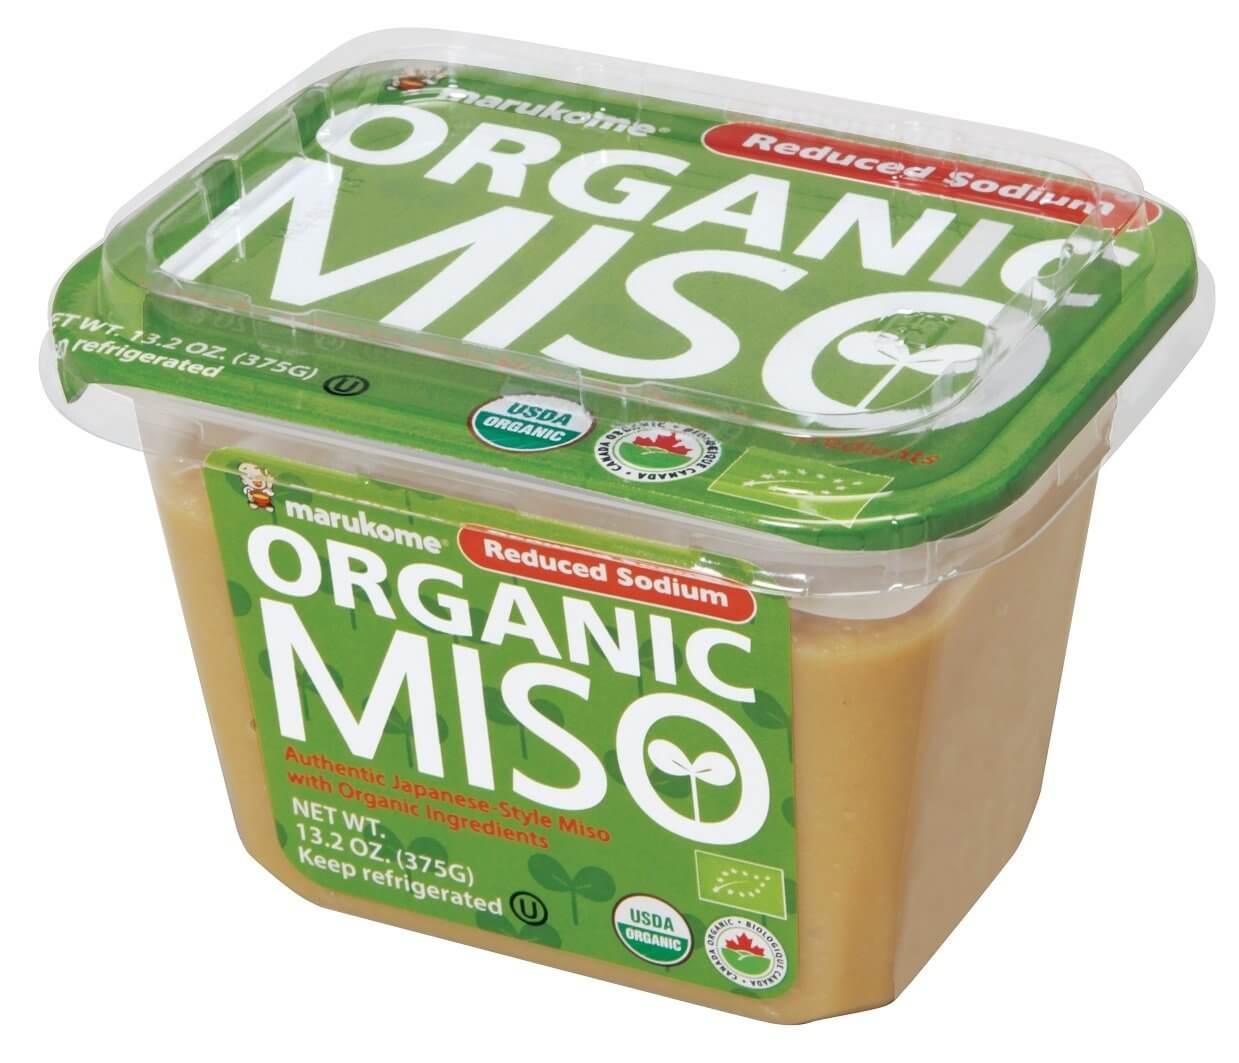 Marukome Reduced Sodium Organic Miso